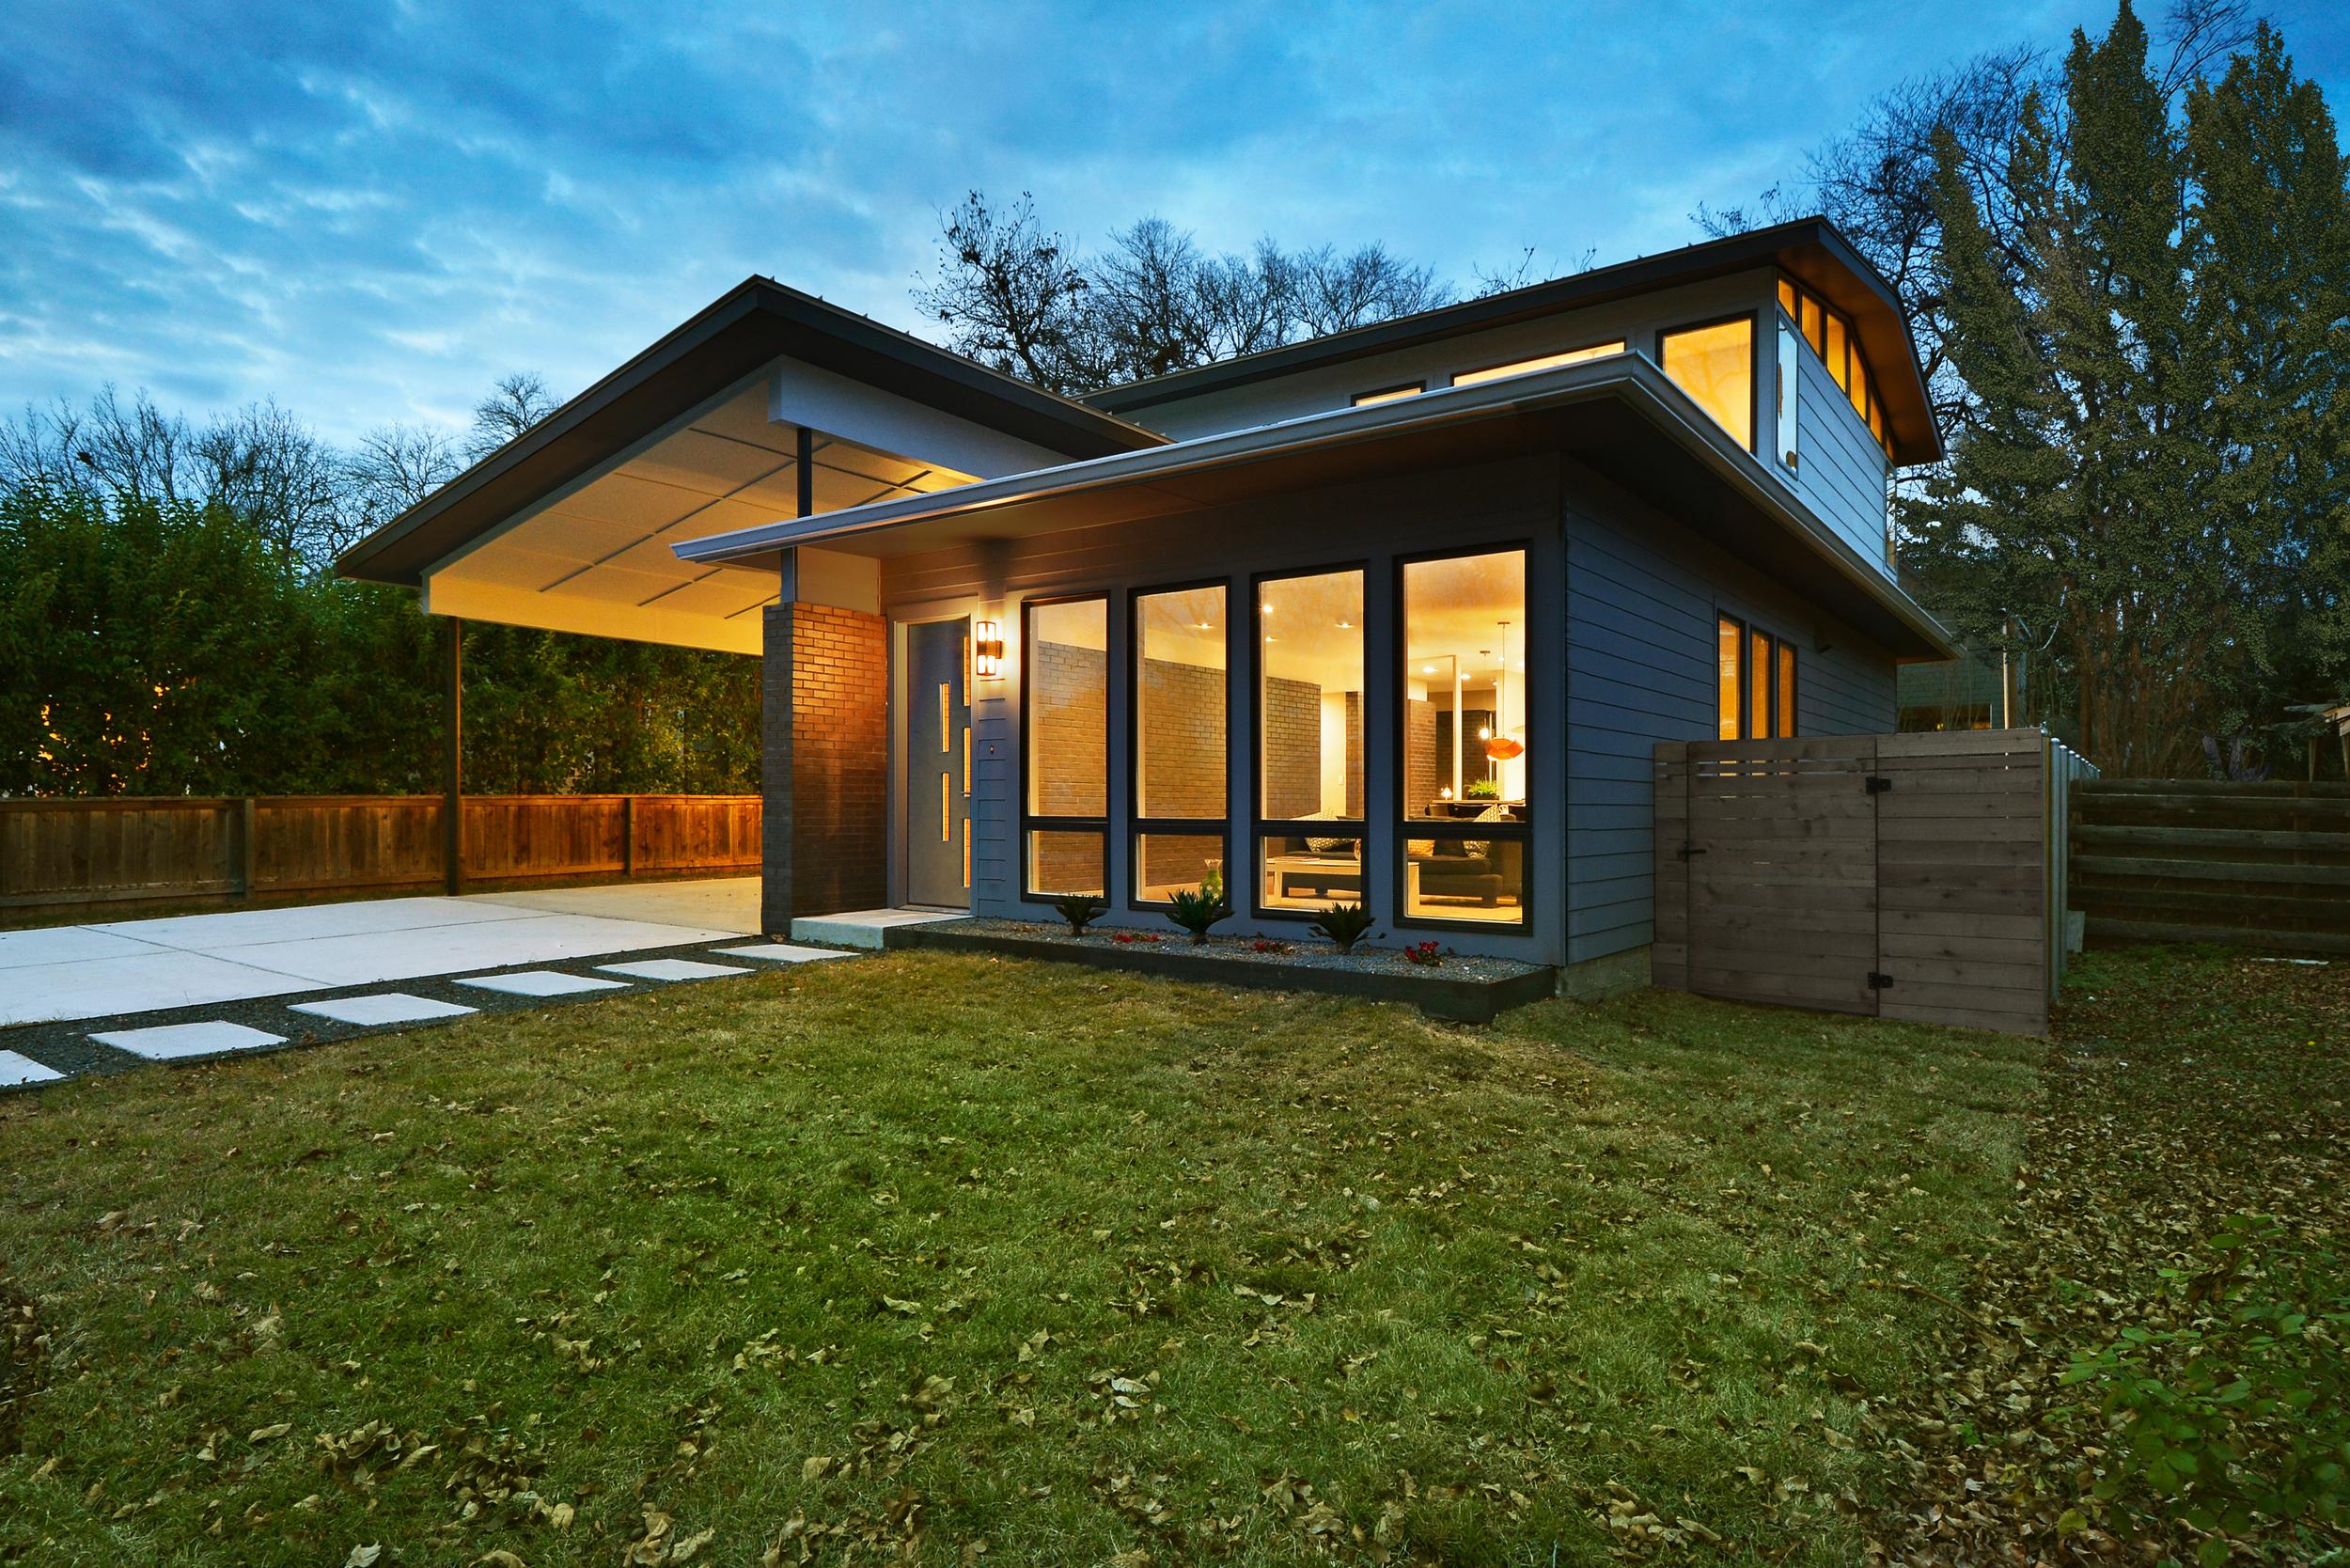 2014_1219 Matt Fajkus MF Architecture Pasadena Threshold House 17.jpg